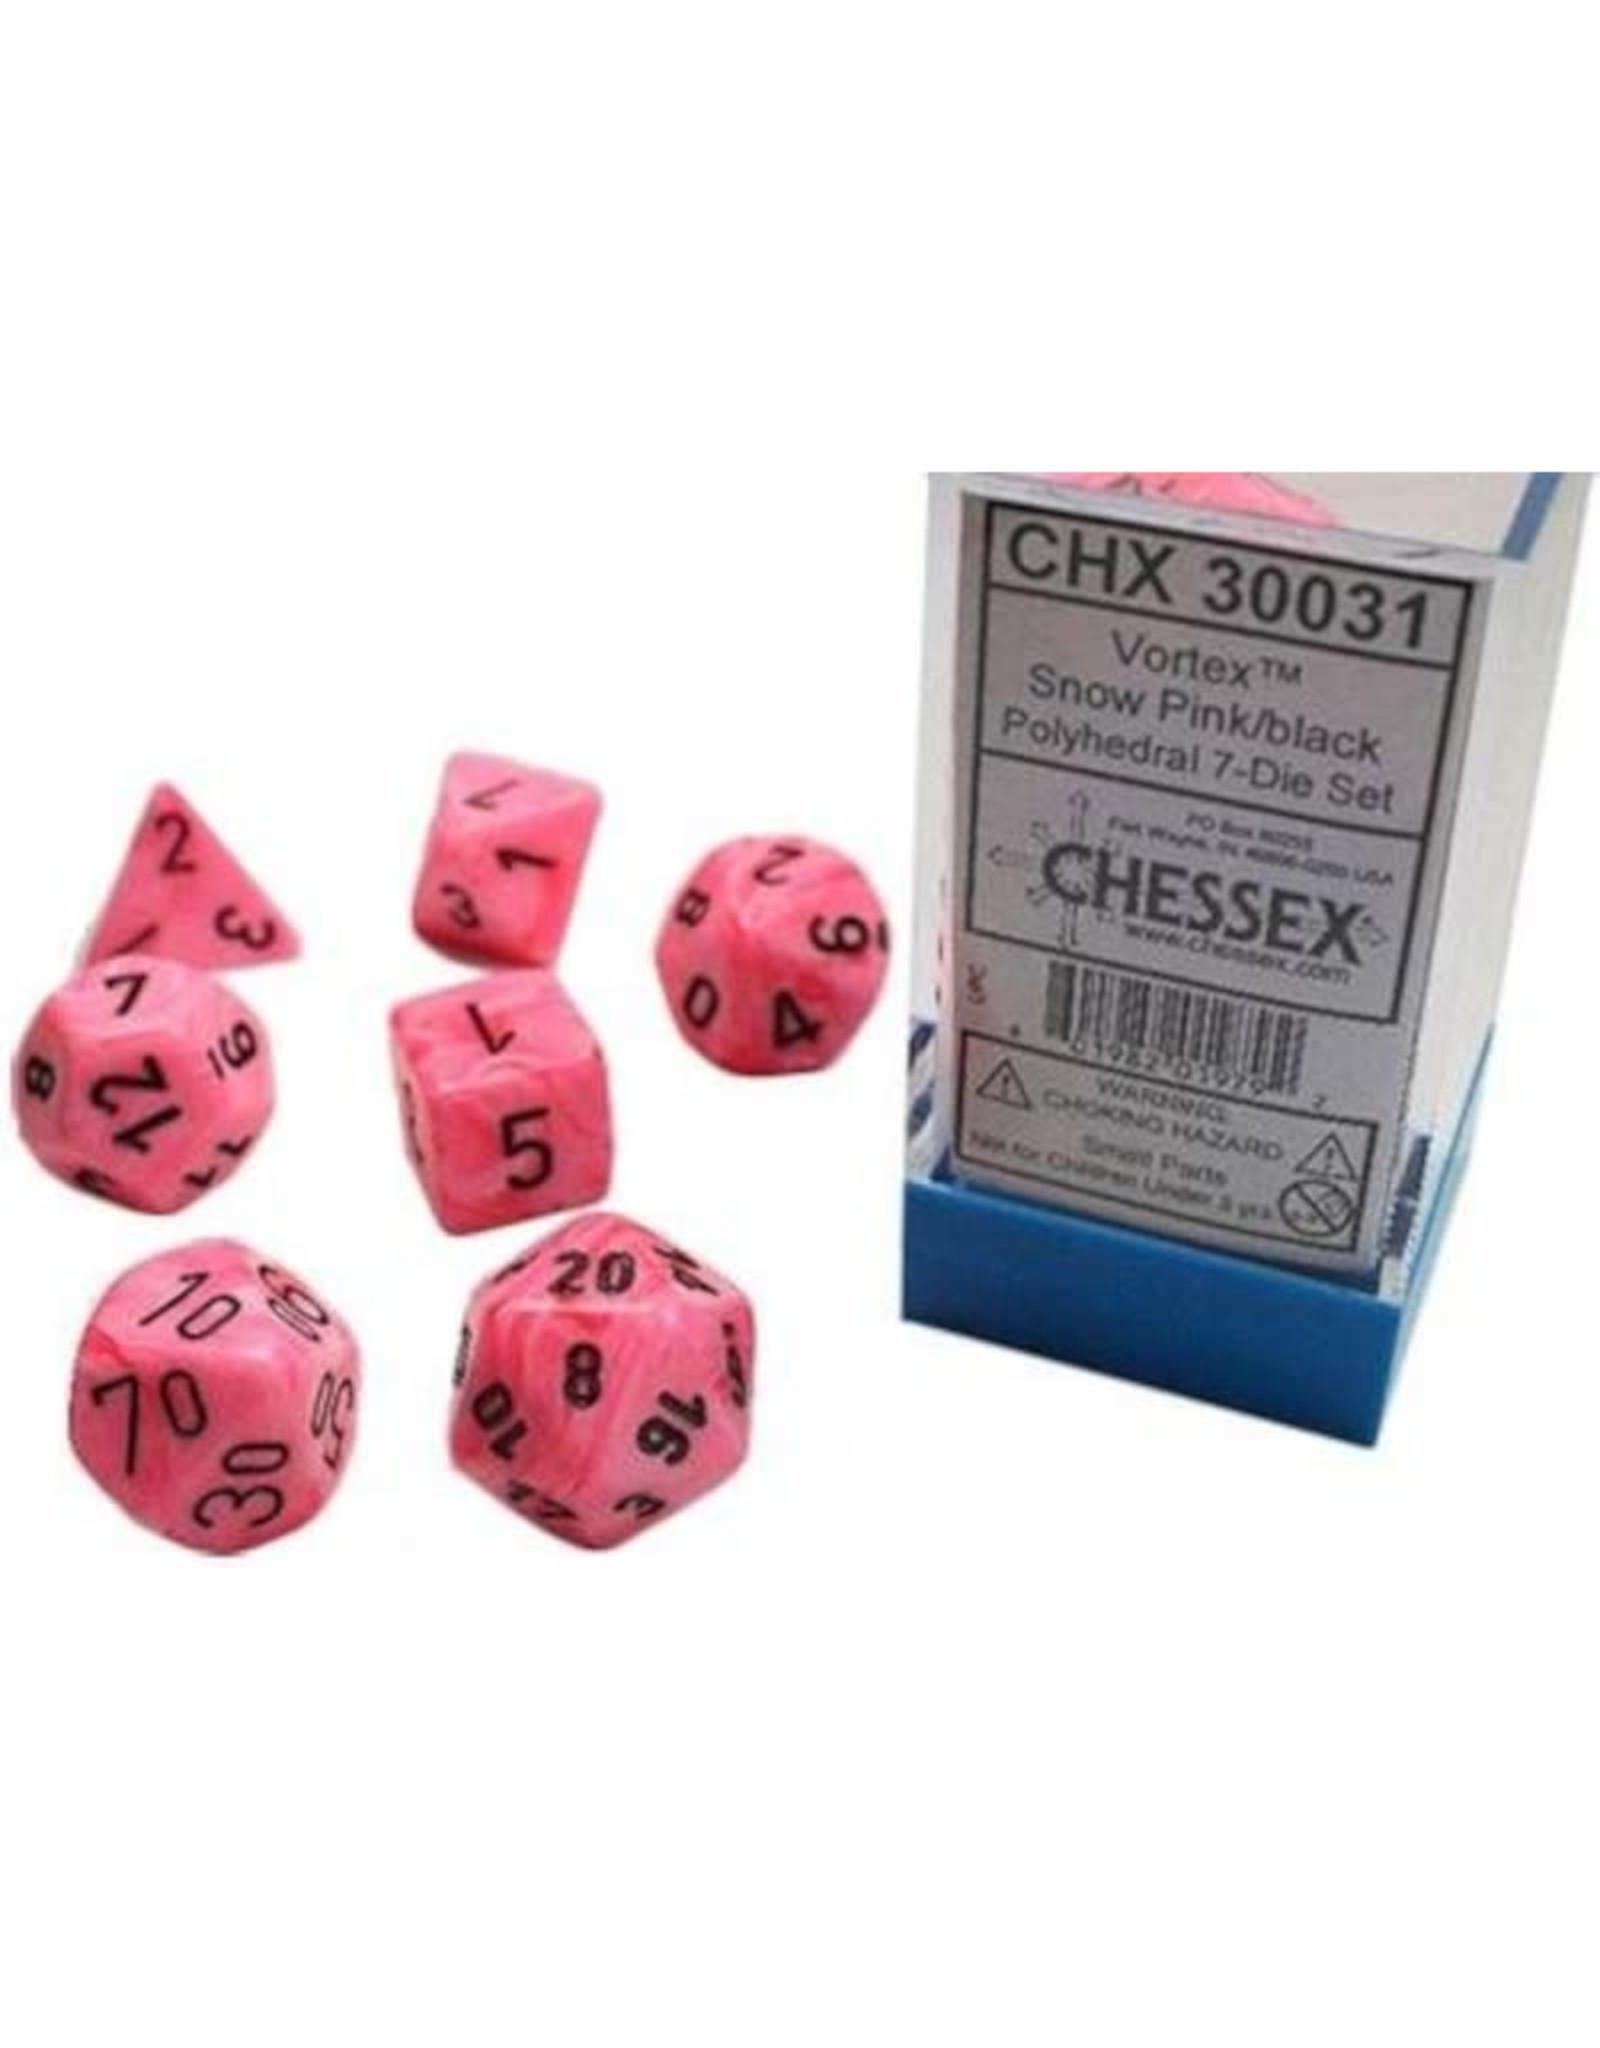 Chessex Polyhedral Lab Dice: Snow Pink/Black (7)